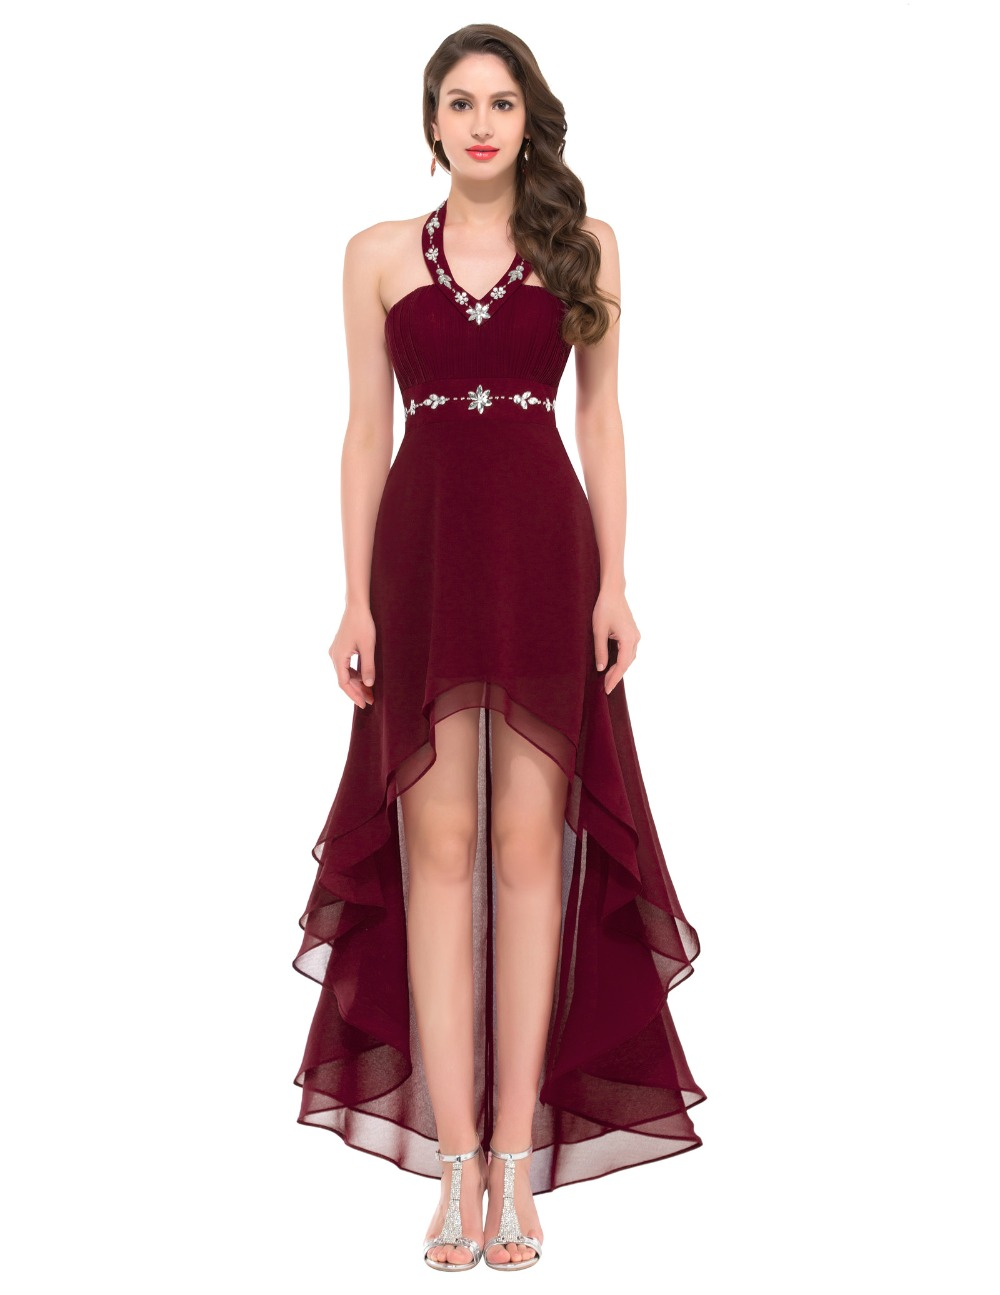 9829e1245d Grace Karin GK000012 Cheap Sexy High Low Halter Black Powder Blue Burgundy  Prom Dresses Short Front Long Back Party Dress Gown